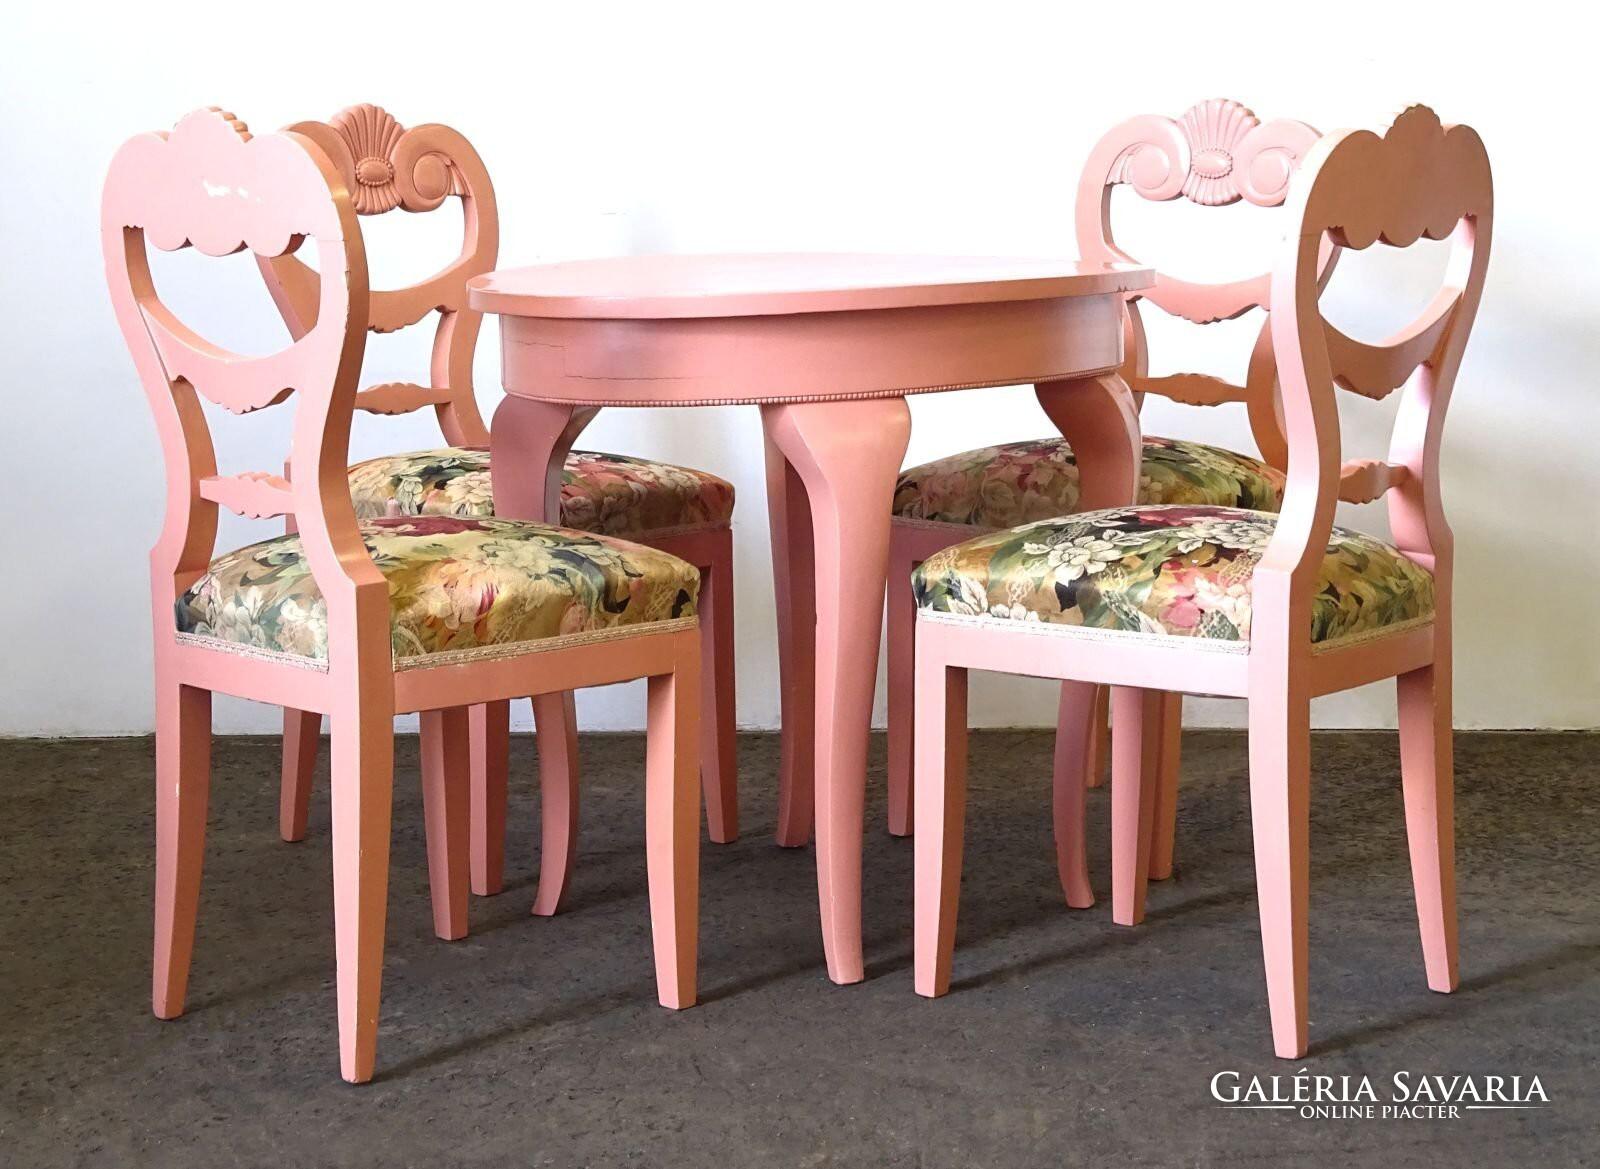 0O650 Öt darabos rózsaszín szalongarnitúra Bútor | Galéria